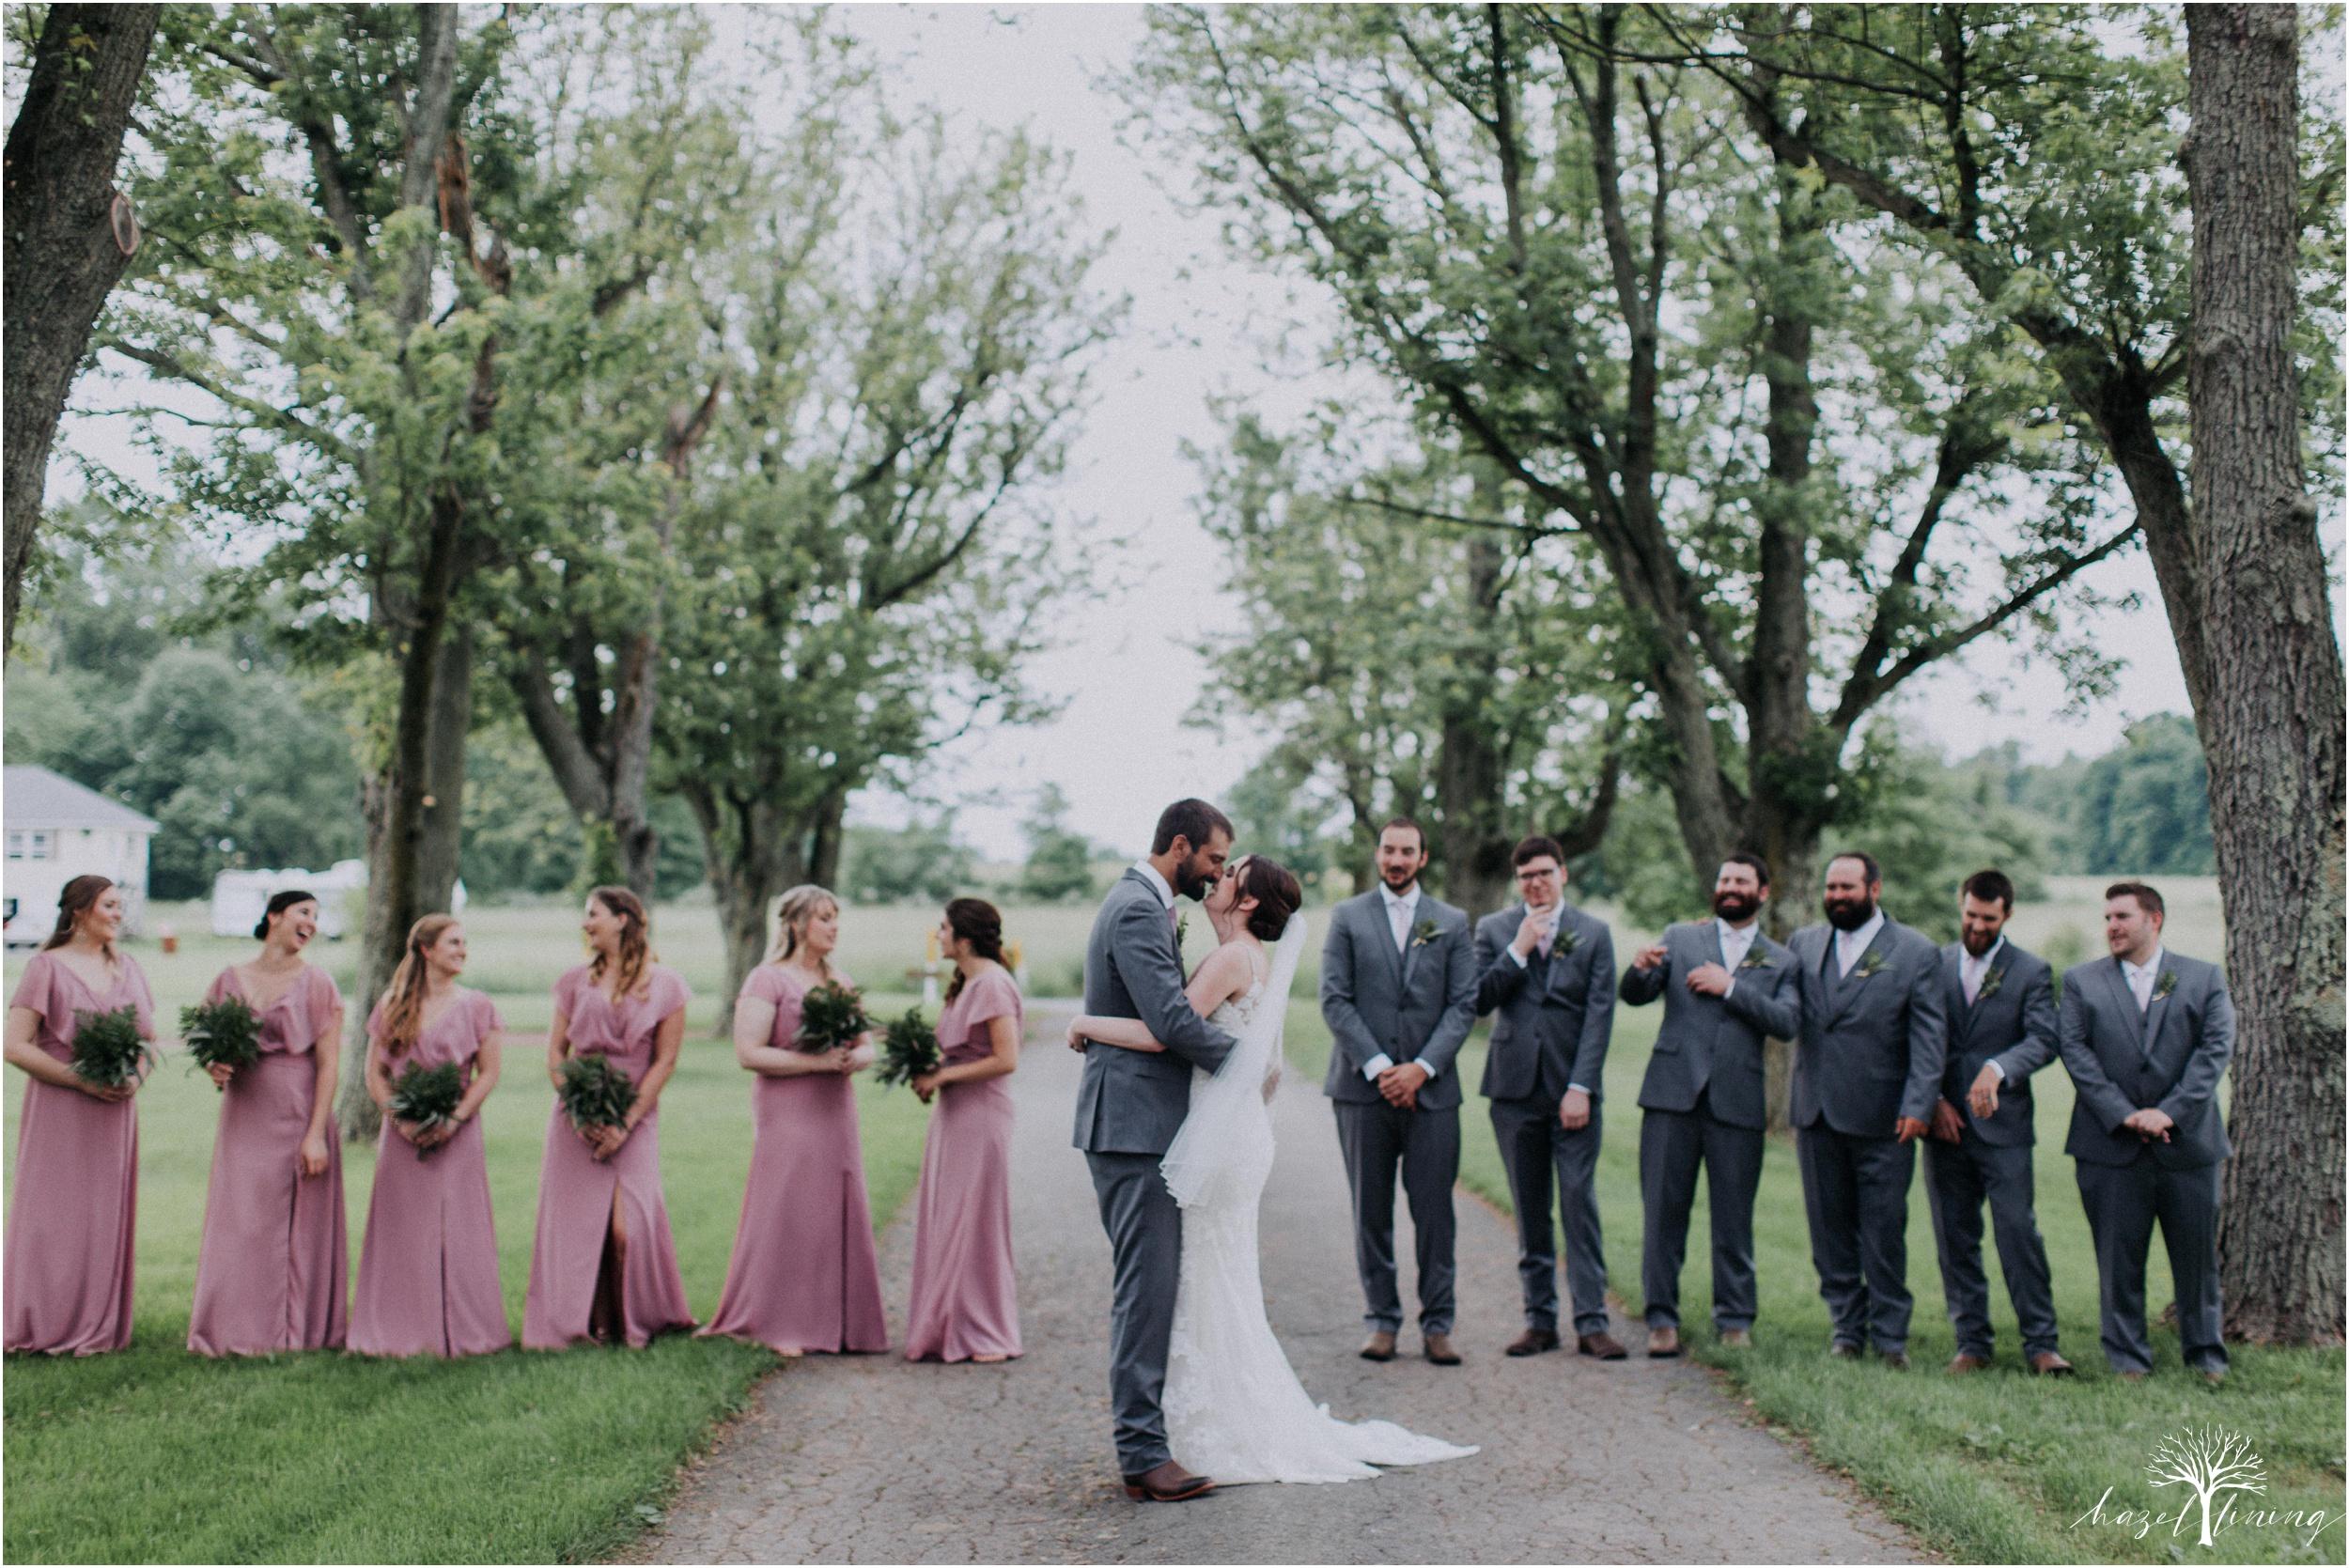 hazel-lining-travel-wedding-elopement-photography-lisa-landon-shoemaker-the-farm-bakery-and-events-bucks-county-quakertown-pennsylvania-summer-country-outdoor-farm-wedding_0073.jpg